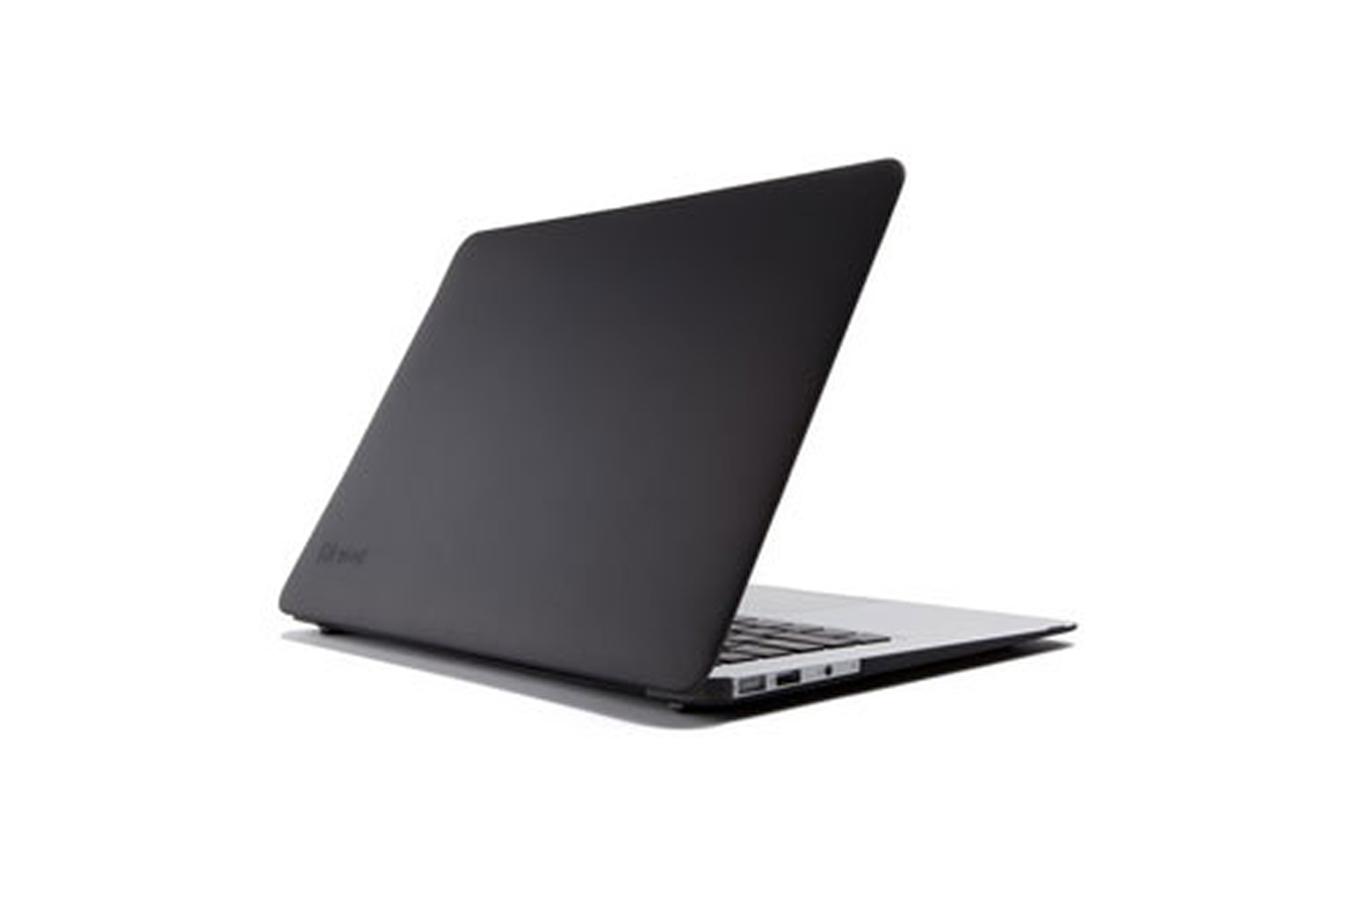 sacoche pour ordinateur portable speck coque seethru satin macbook air 13 seethru 1367277. Black Bedroom Furniture Sets. Home Design Ideas